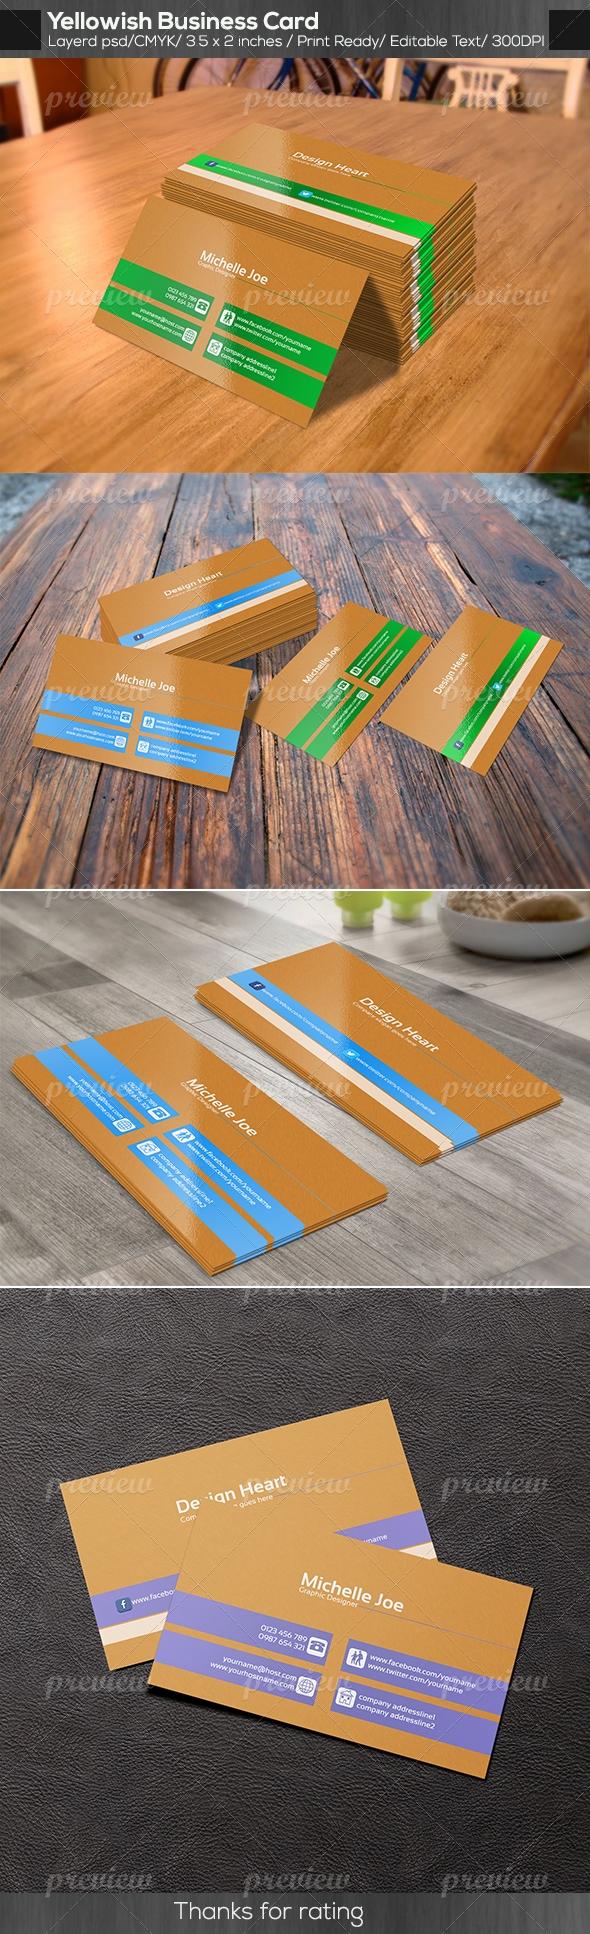 Yellowlish Business Card